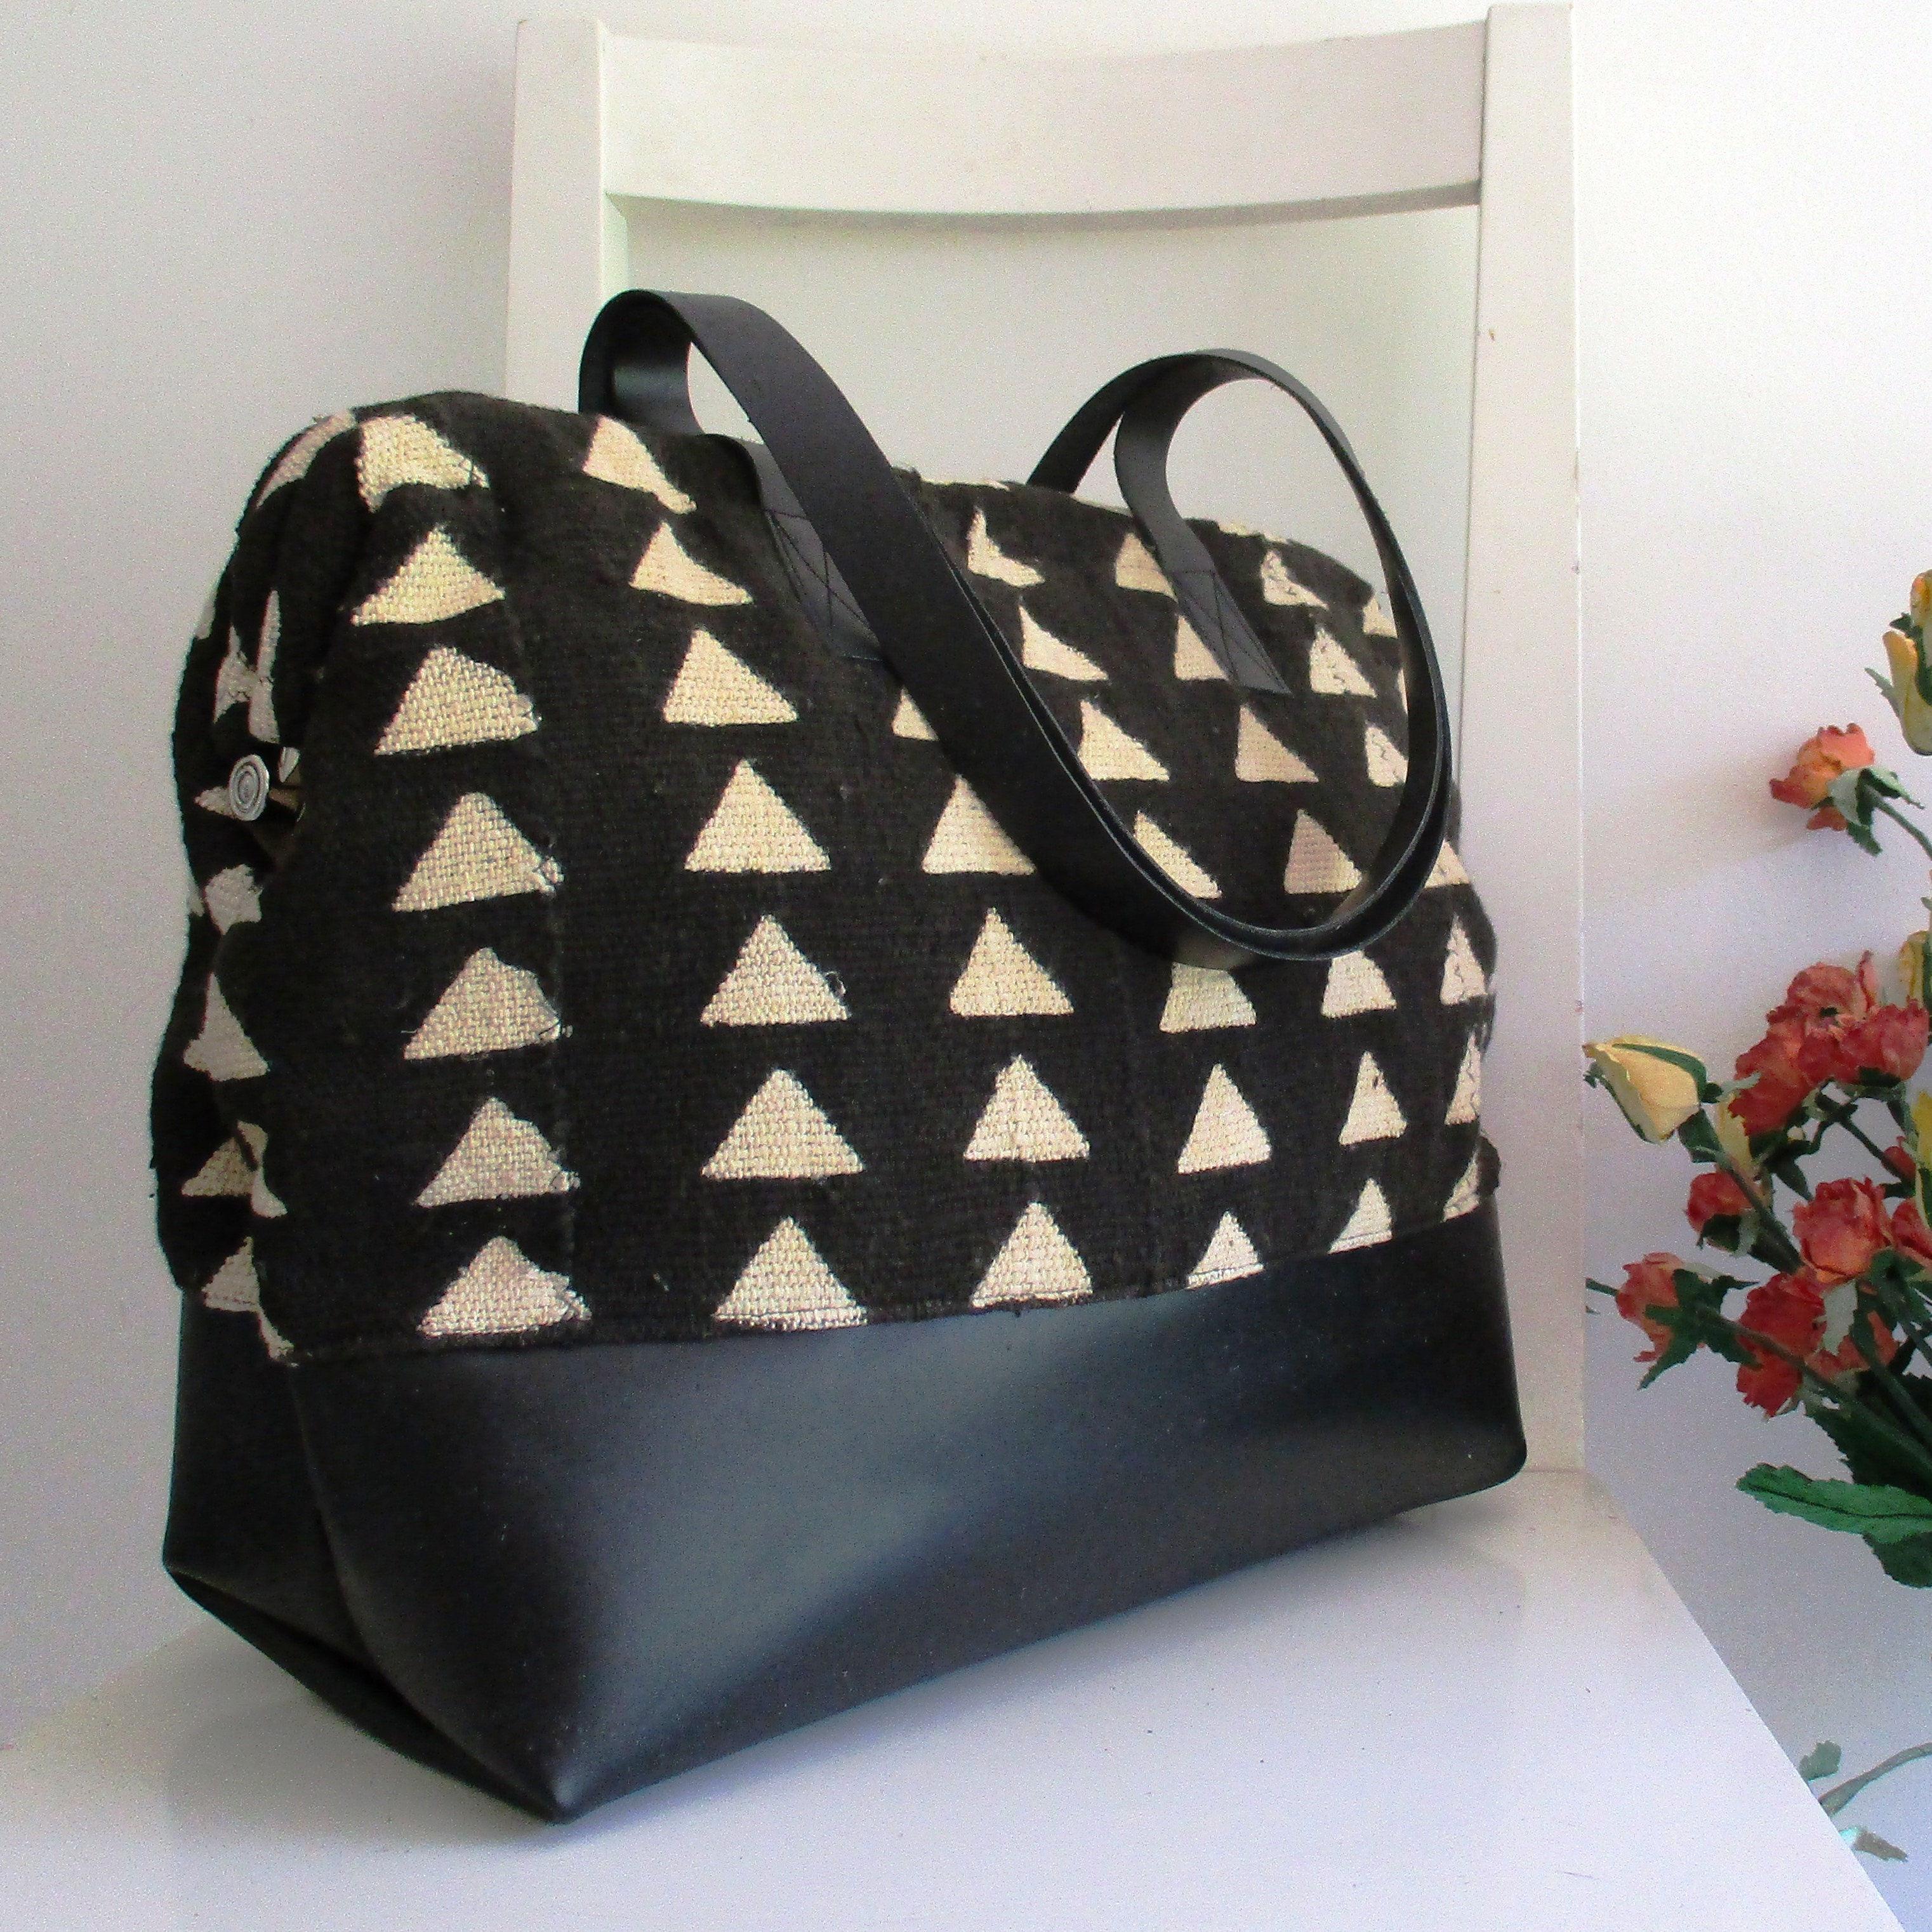 Rutinet Handmade Bags Design by rutinet on Etsy